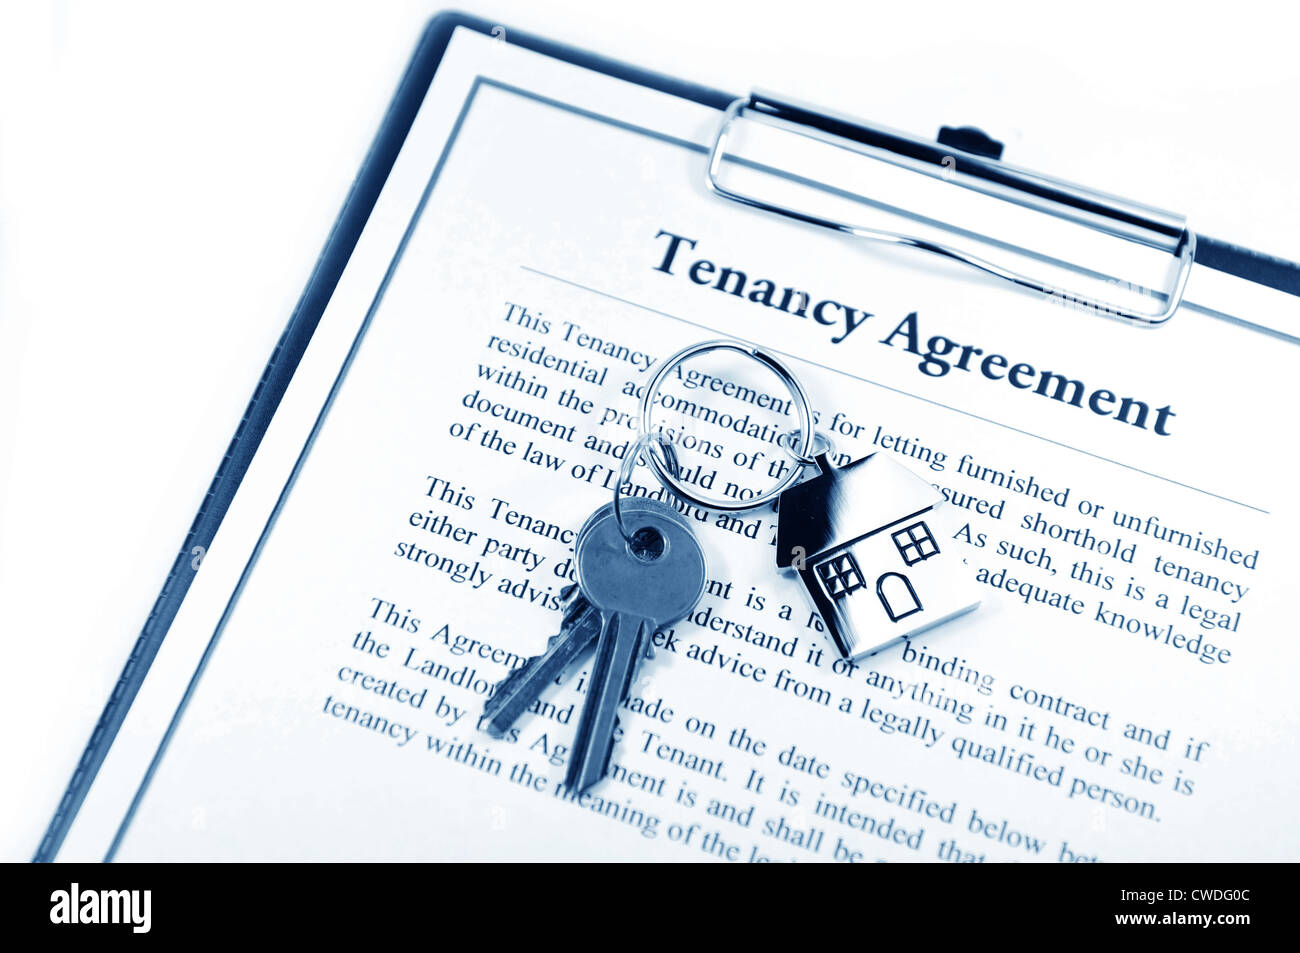 Tenants Agreement Stock Photos Tenants Agreement Stock Images Alamy